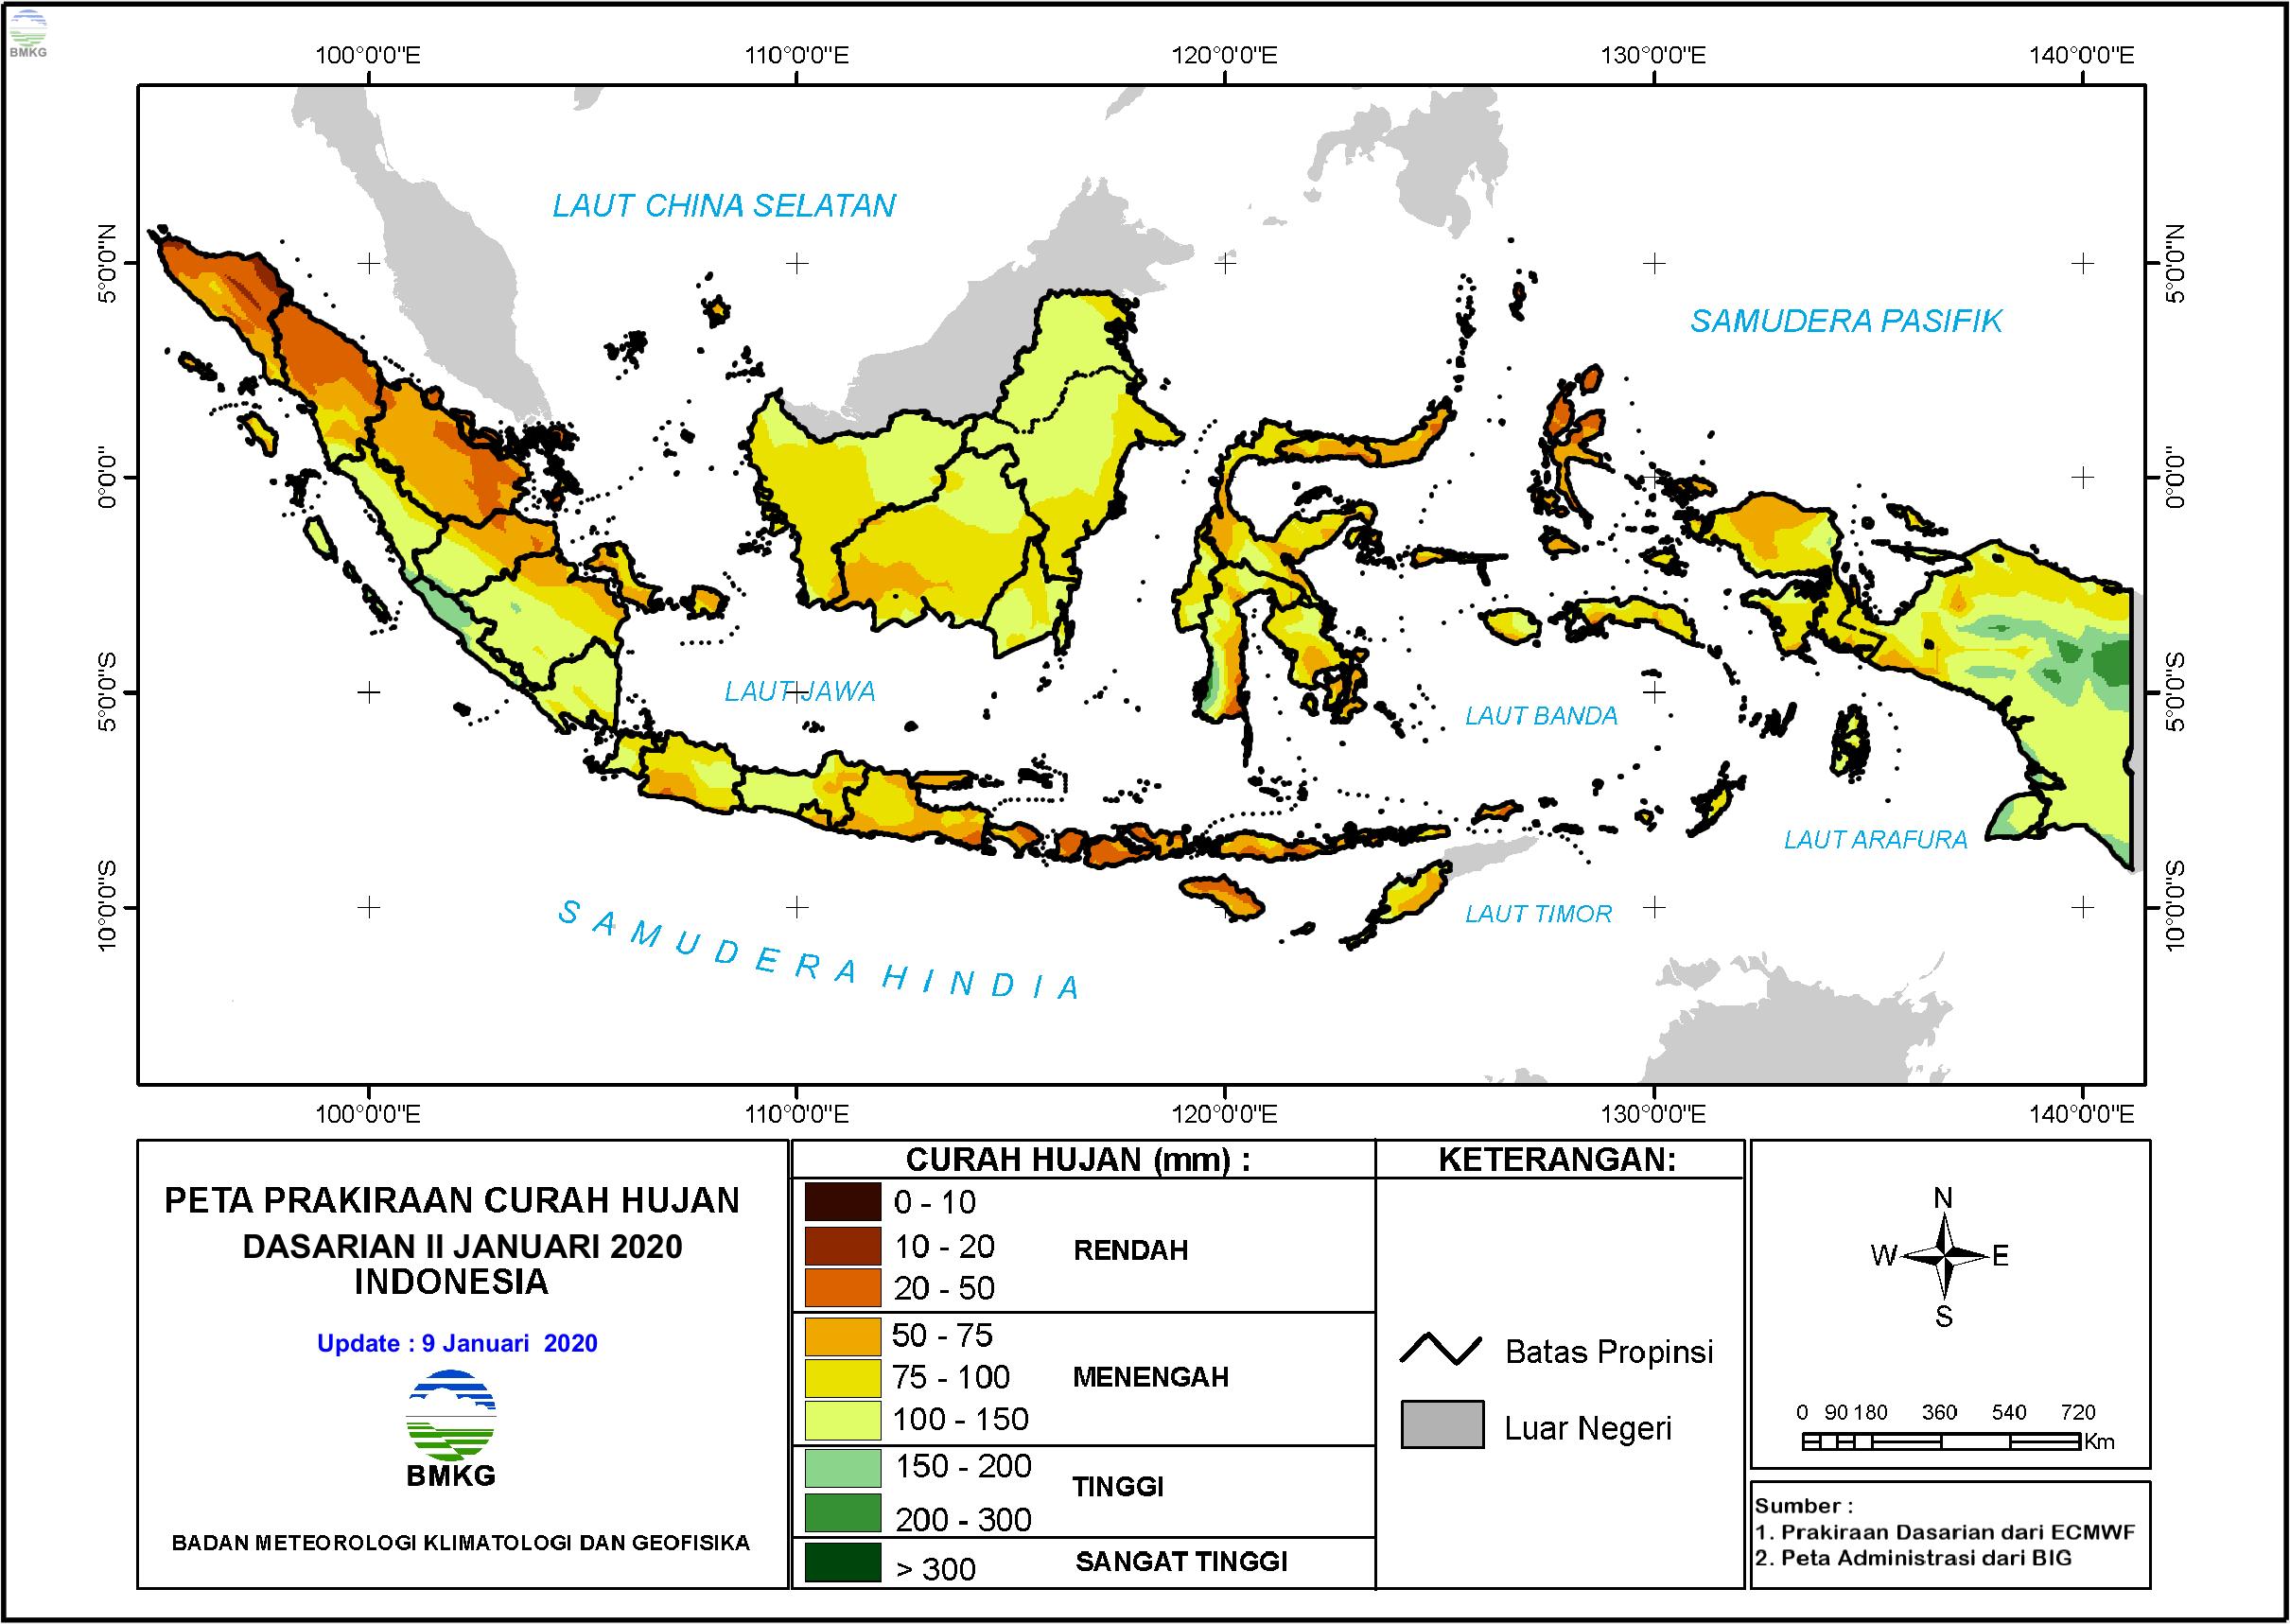 Prakiraan Hujan Dasarian II - III Januari dan I Februari 2020